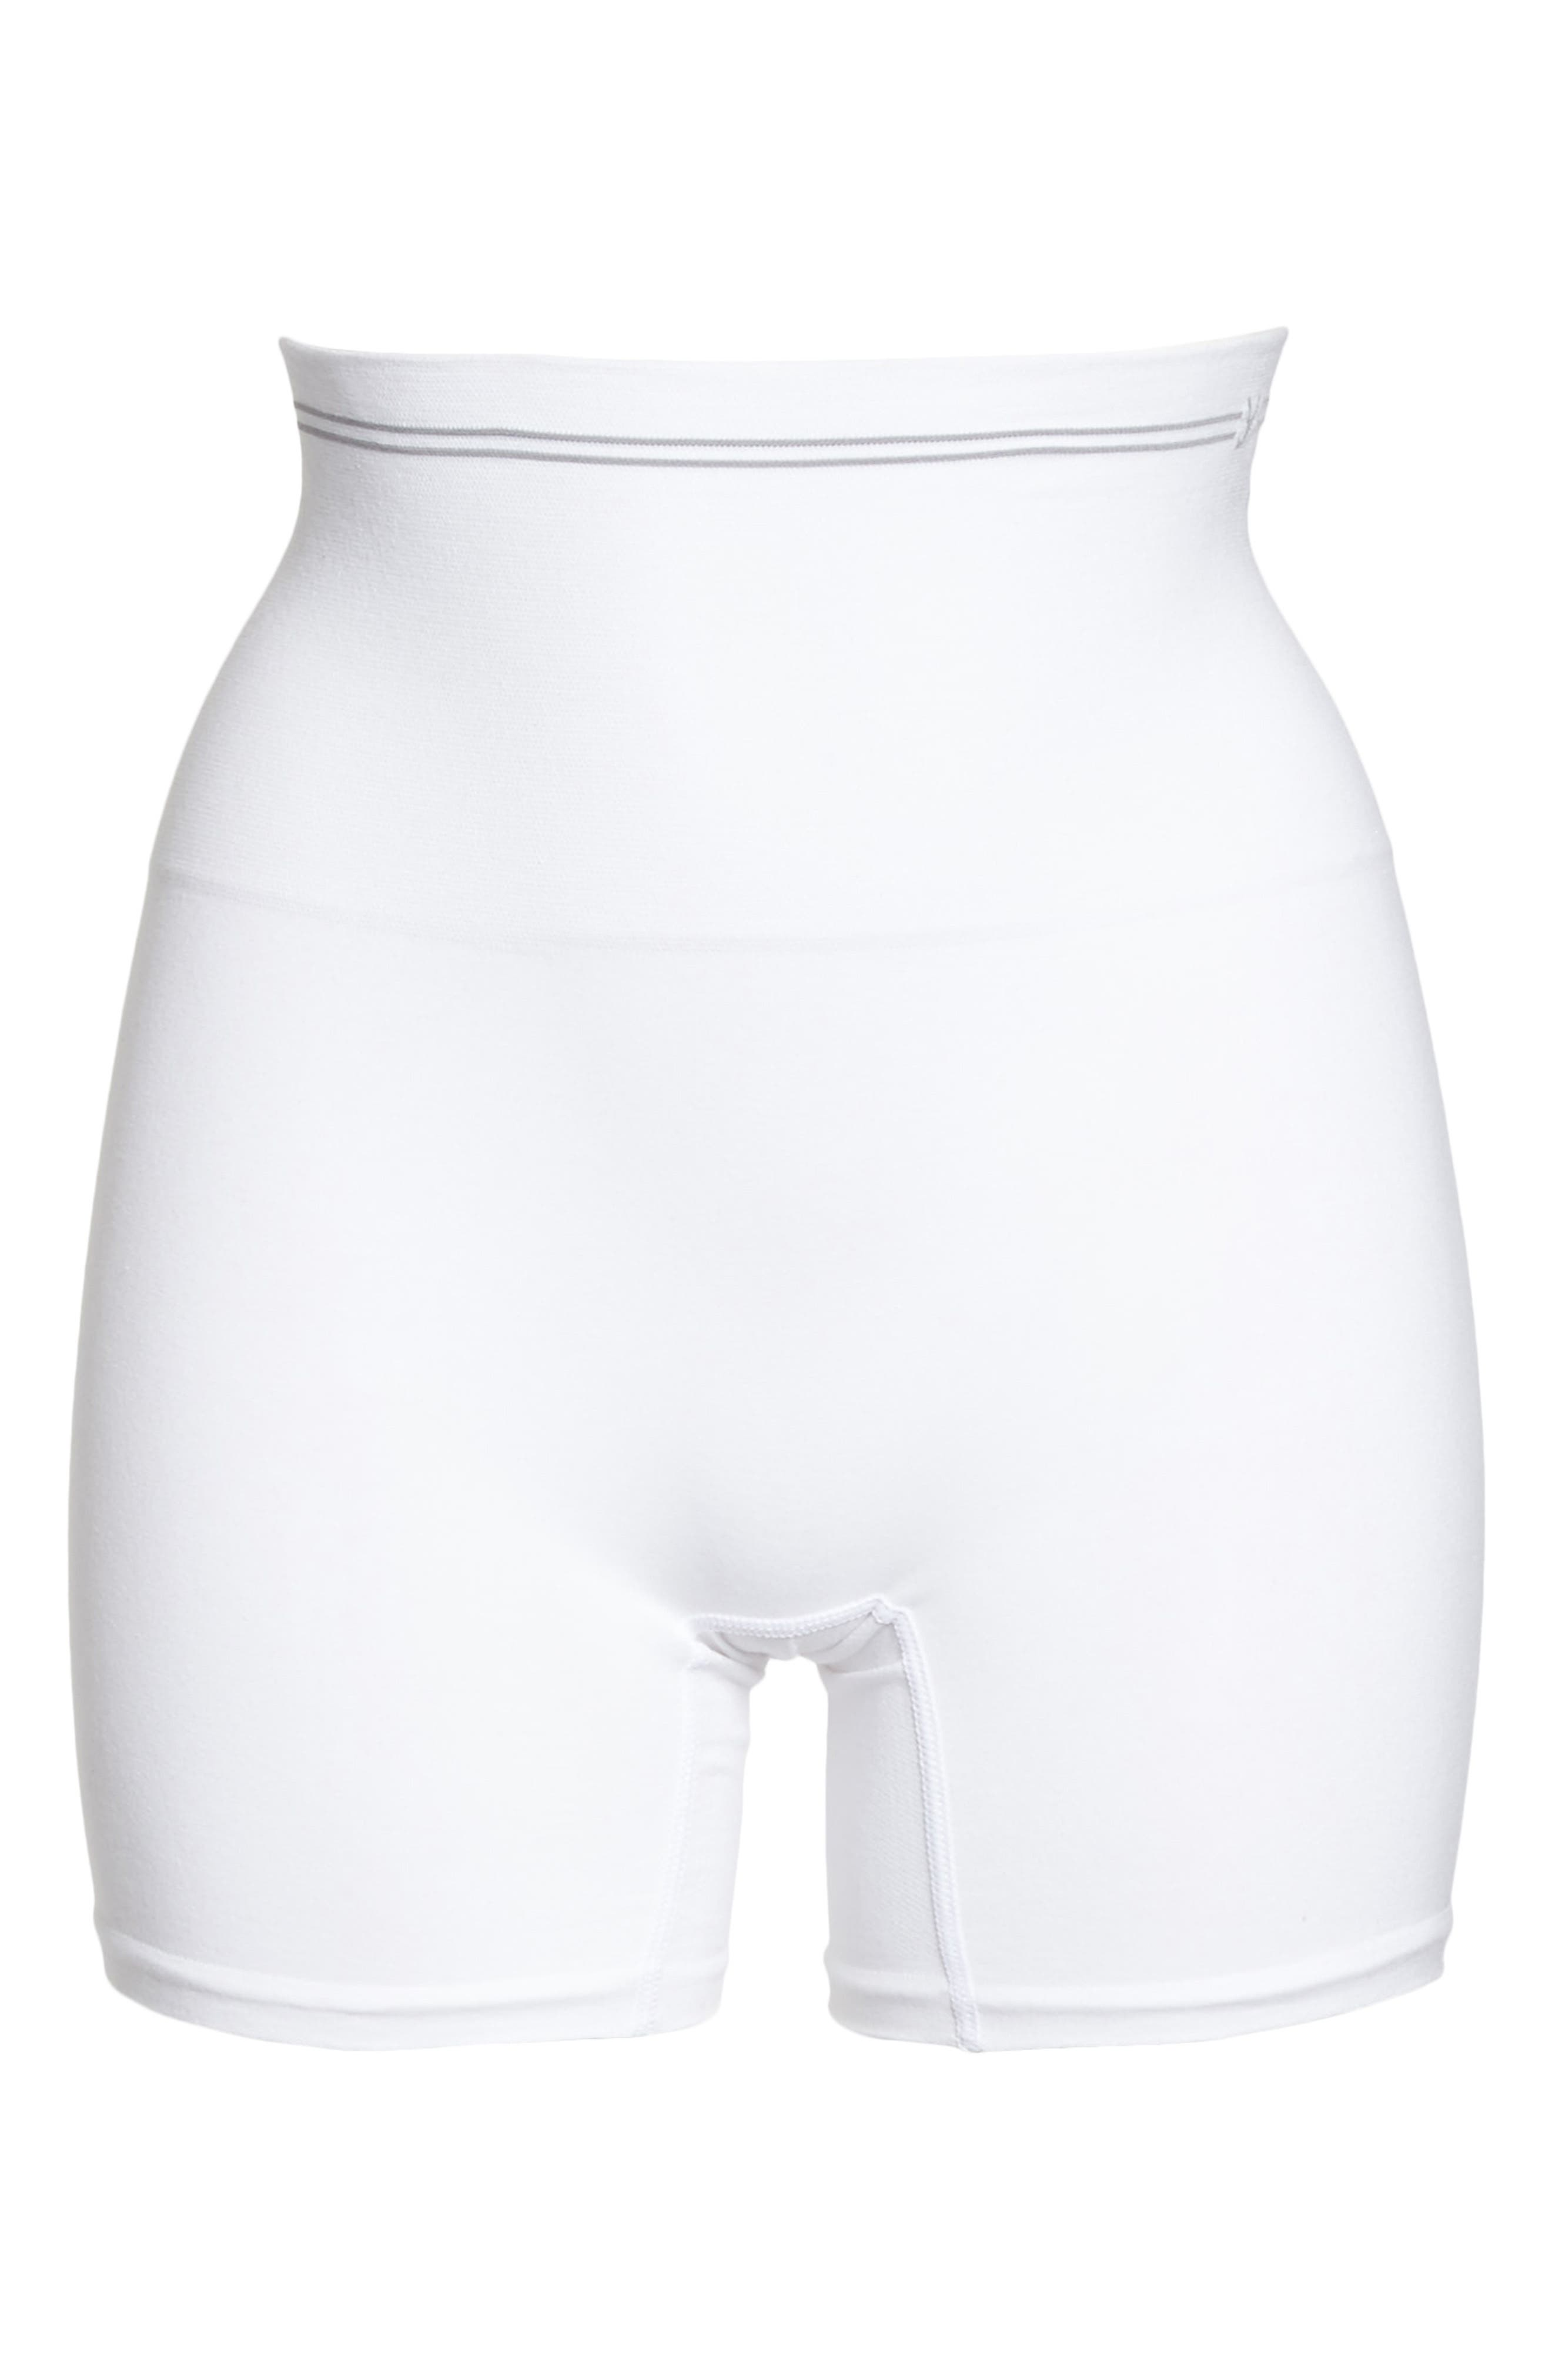 Seamless Shaping Shorts,                             Alternate thumbnail 4, color,                             White